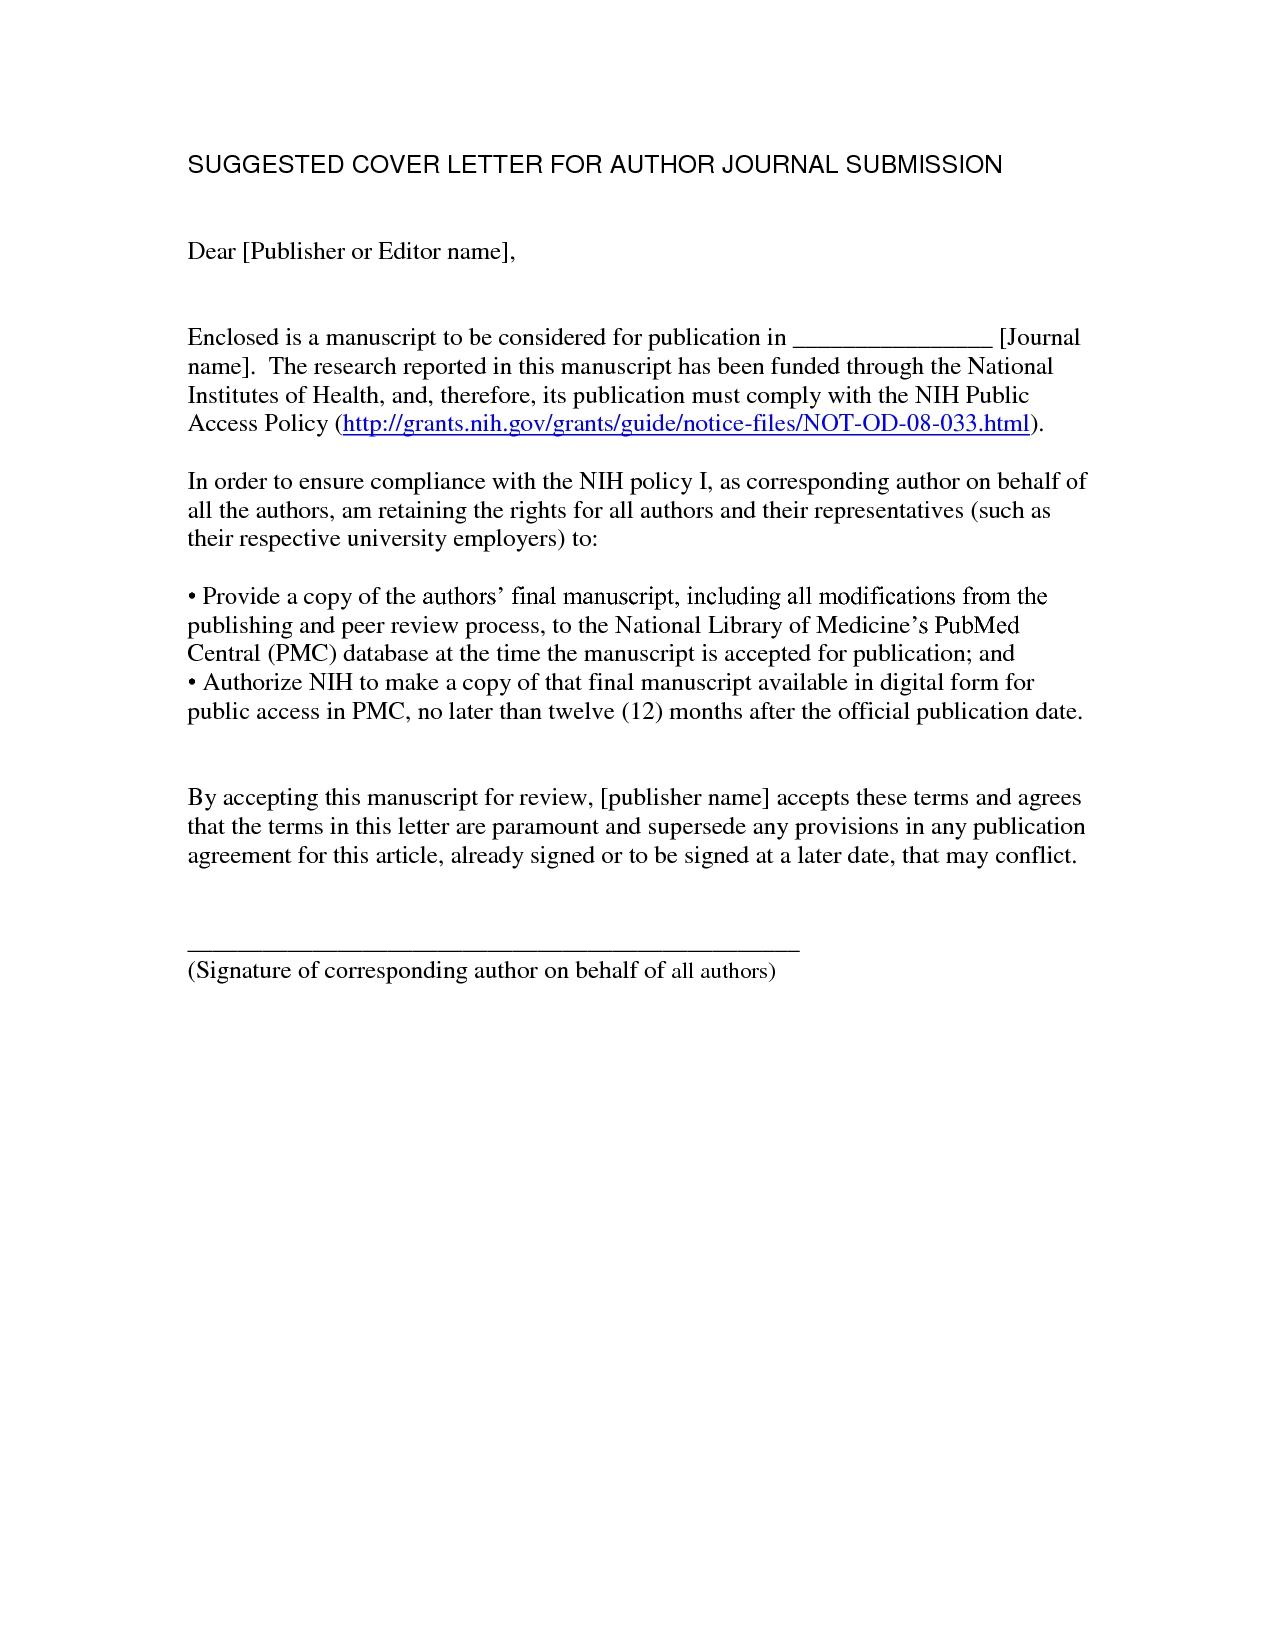 Resume Genius Cover Letter Template - Resume Genius Scam Copywriter Cover Letter Sample Resume Genius